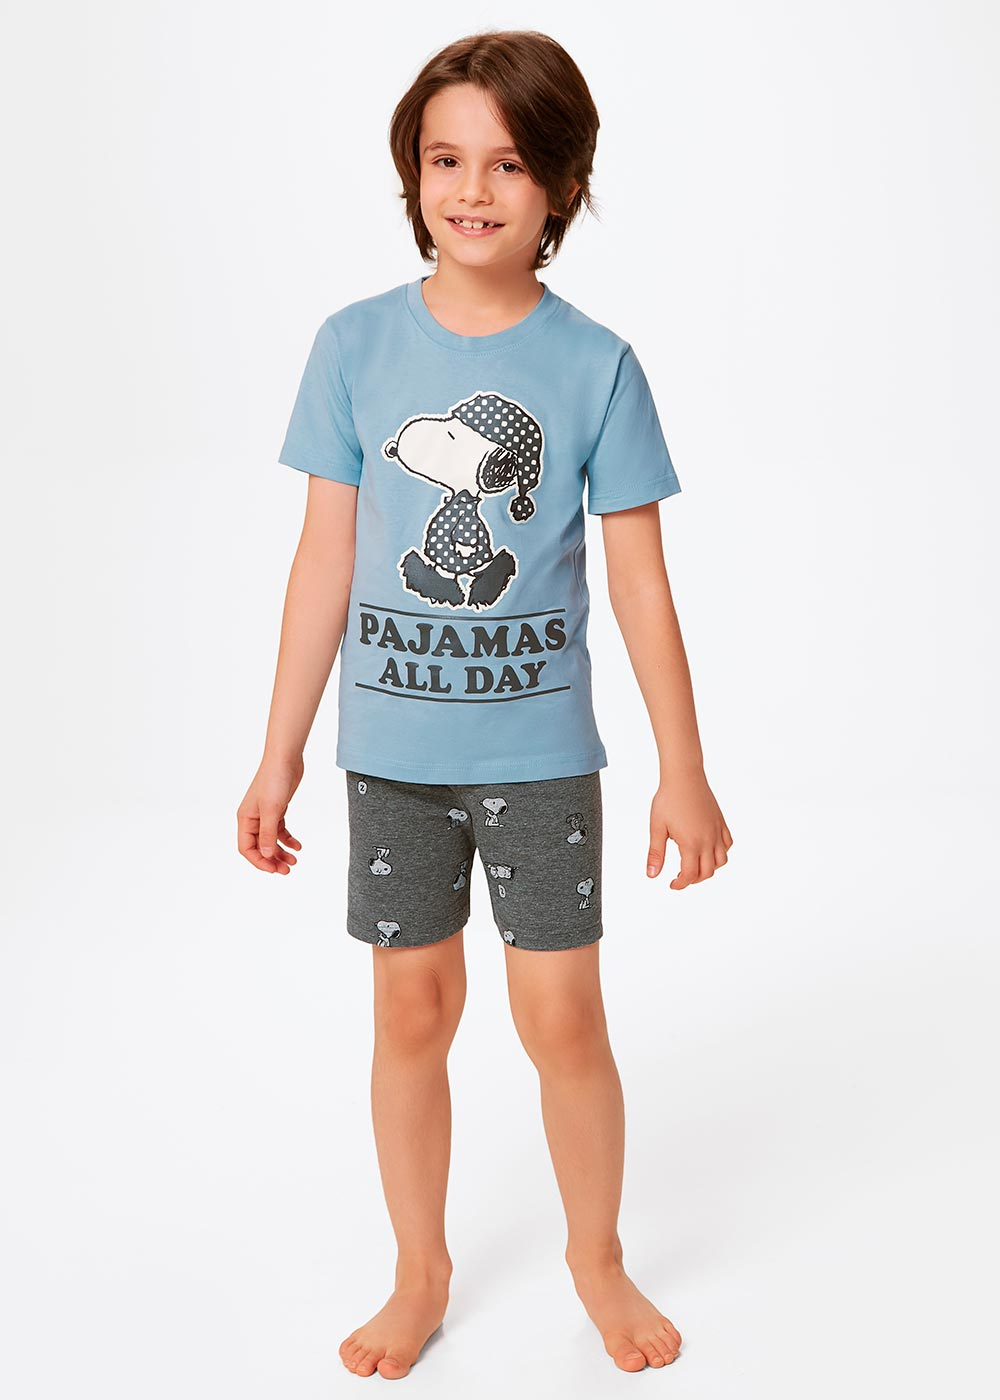 Pijama Infantil Masculino Verão Azul Snoopy - Malwee